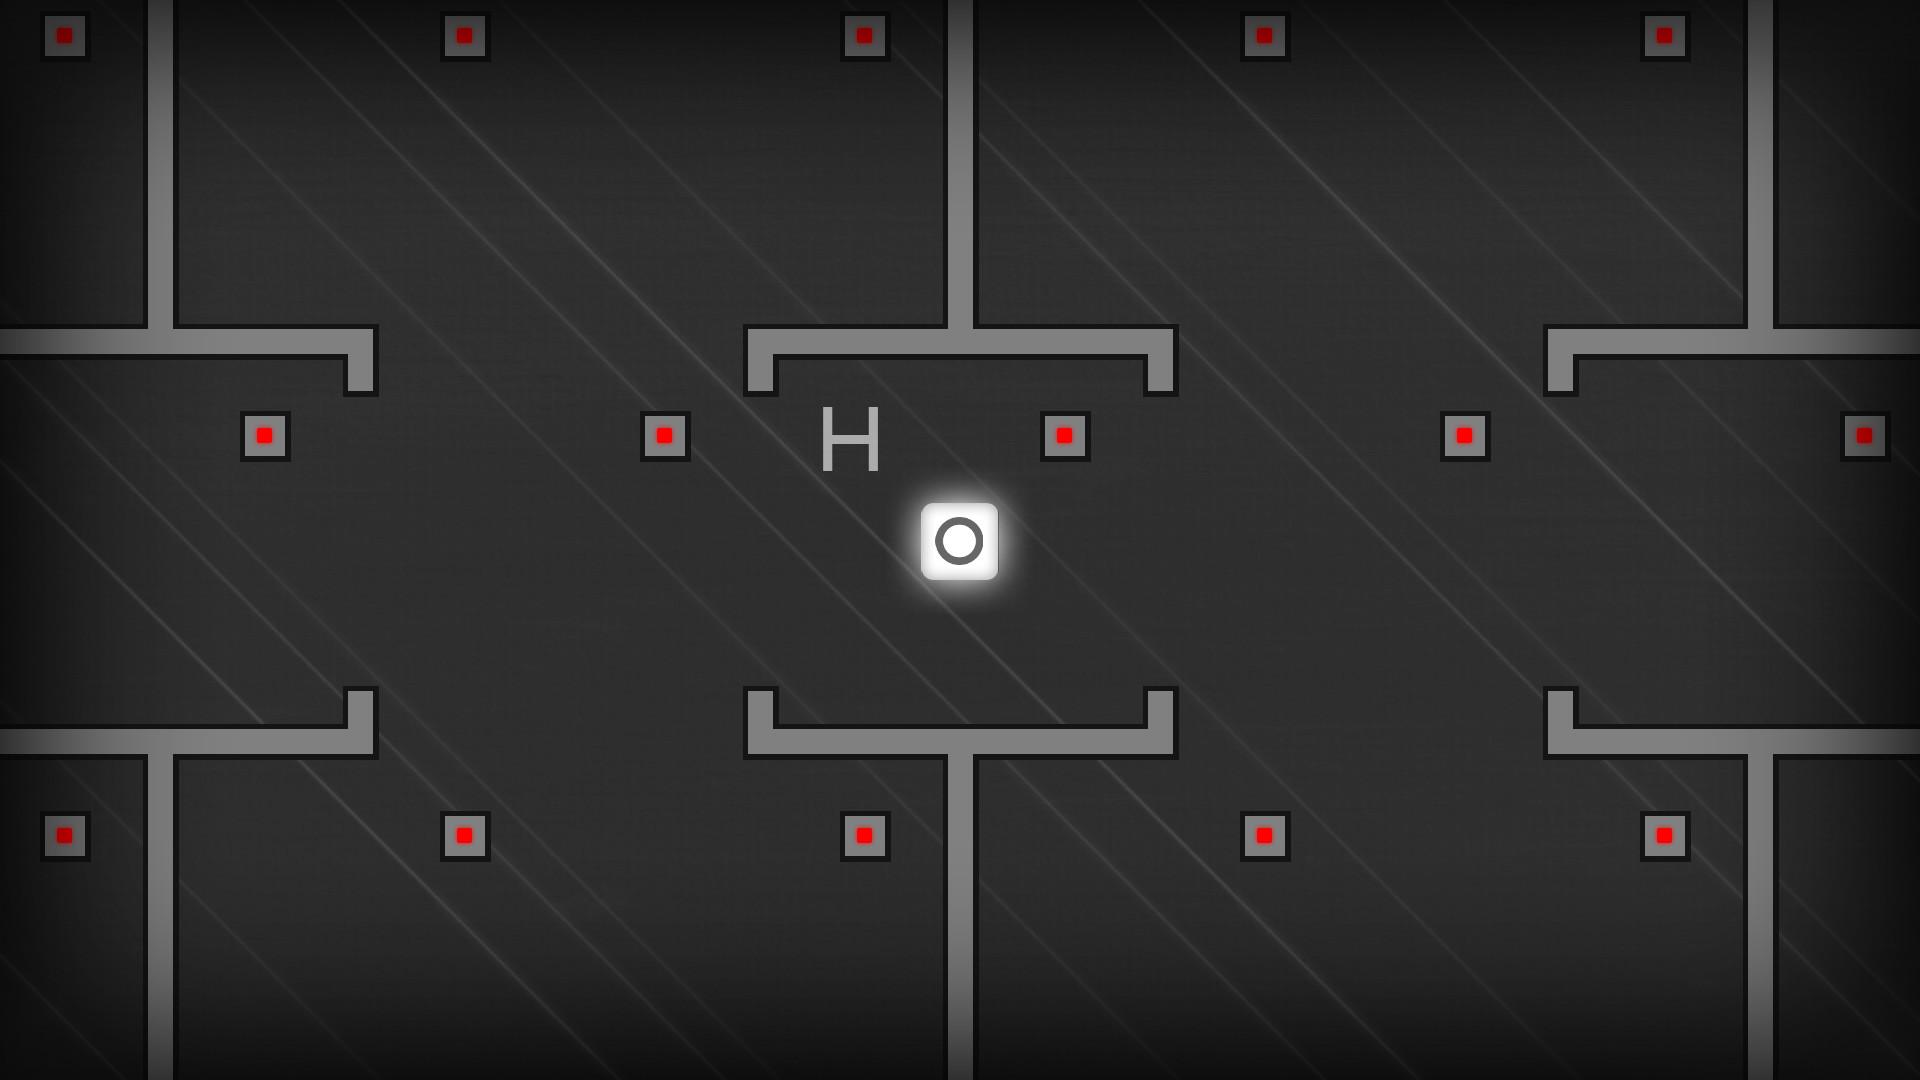 Innovative puzzler Keyg released